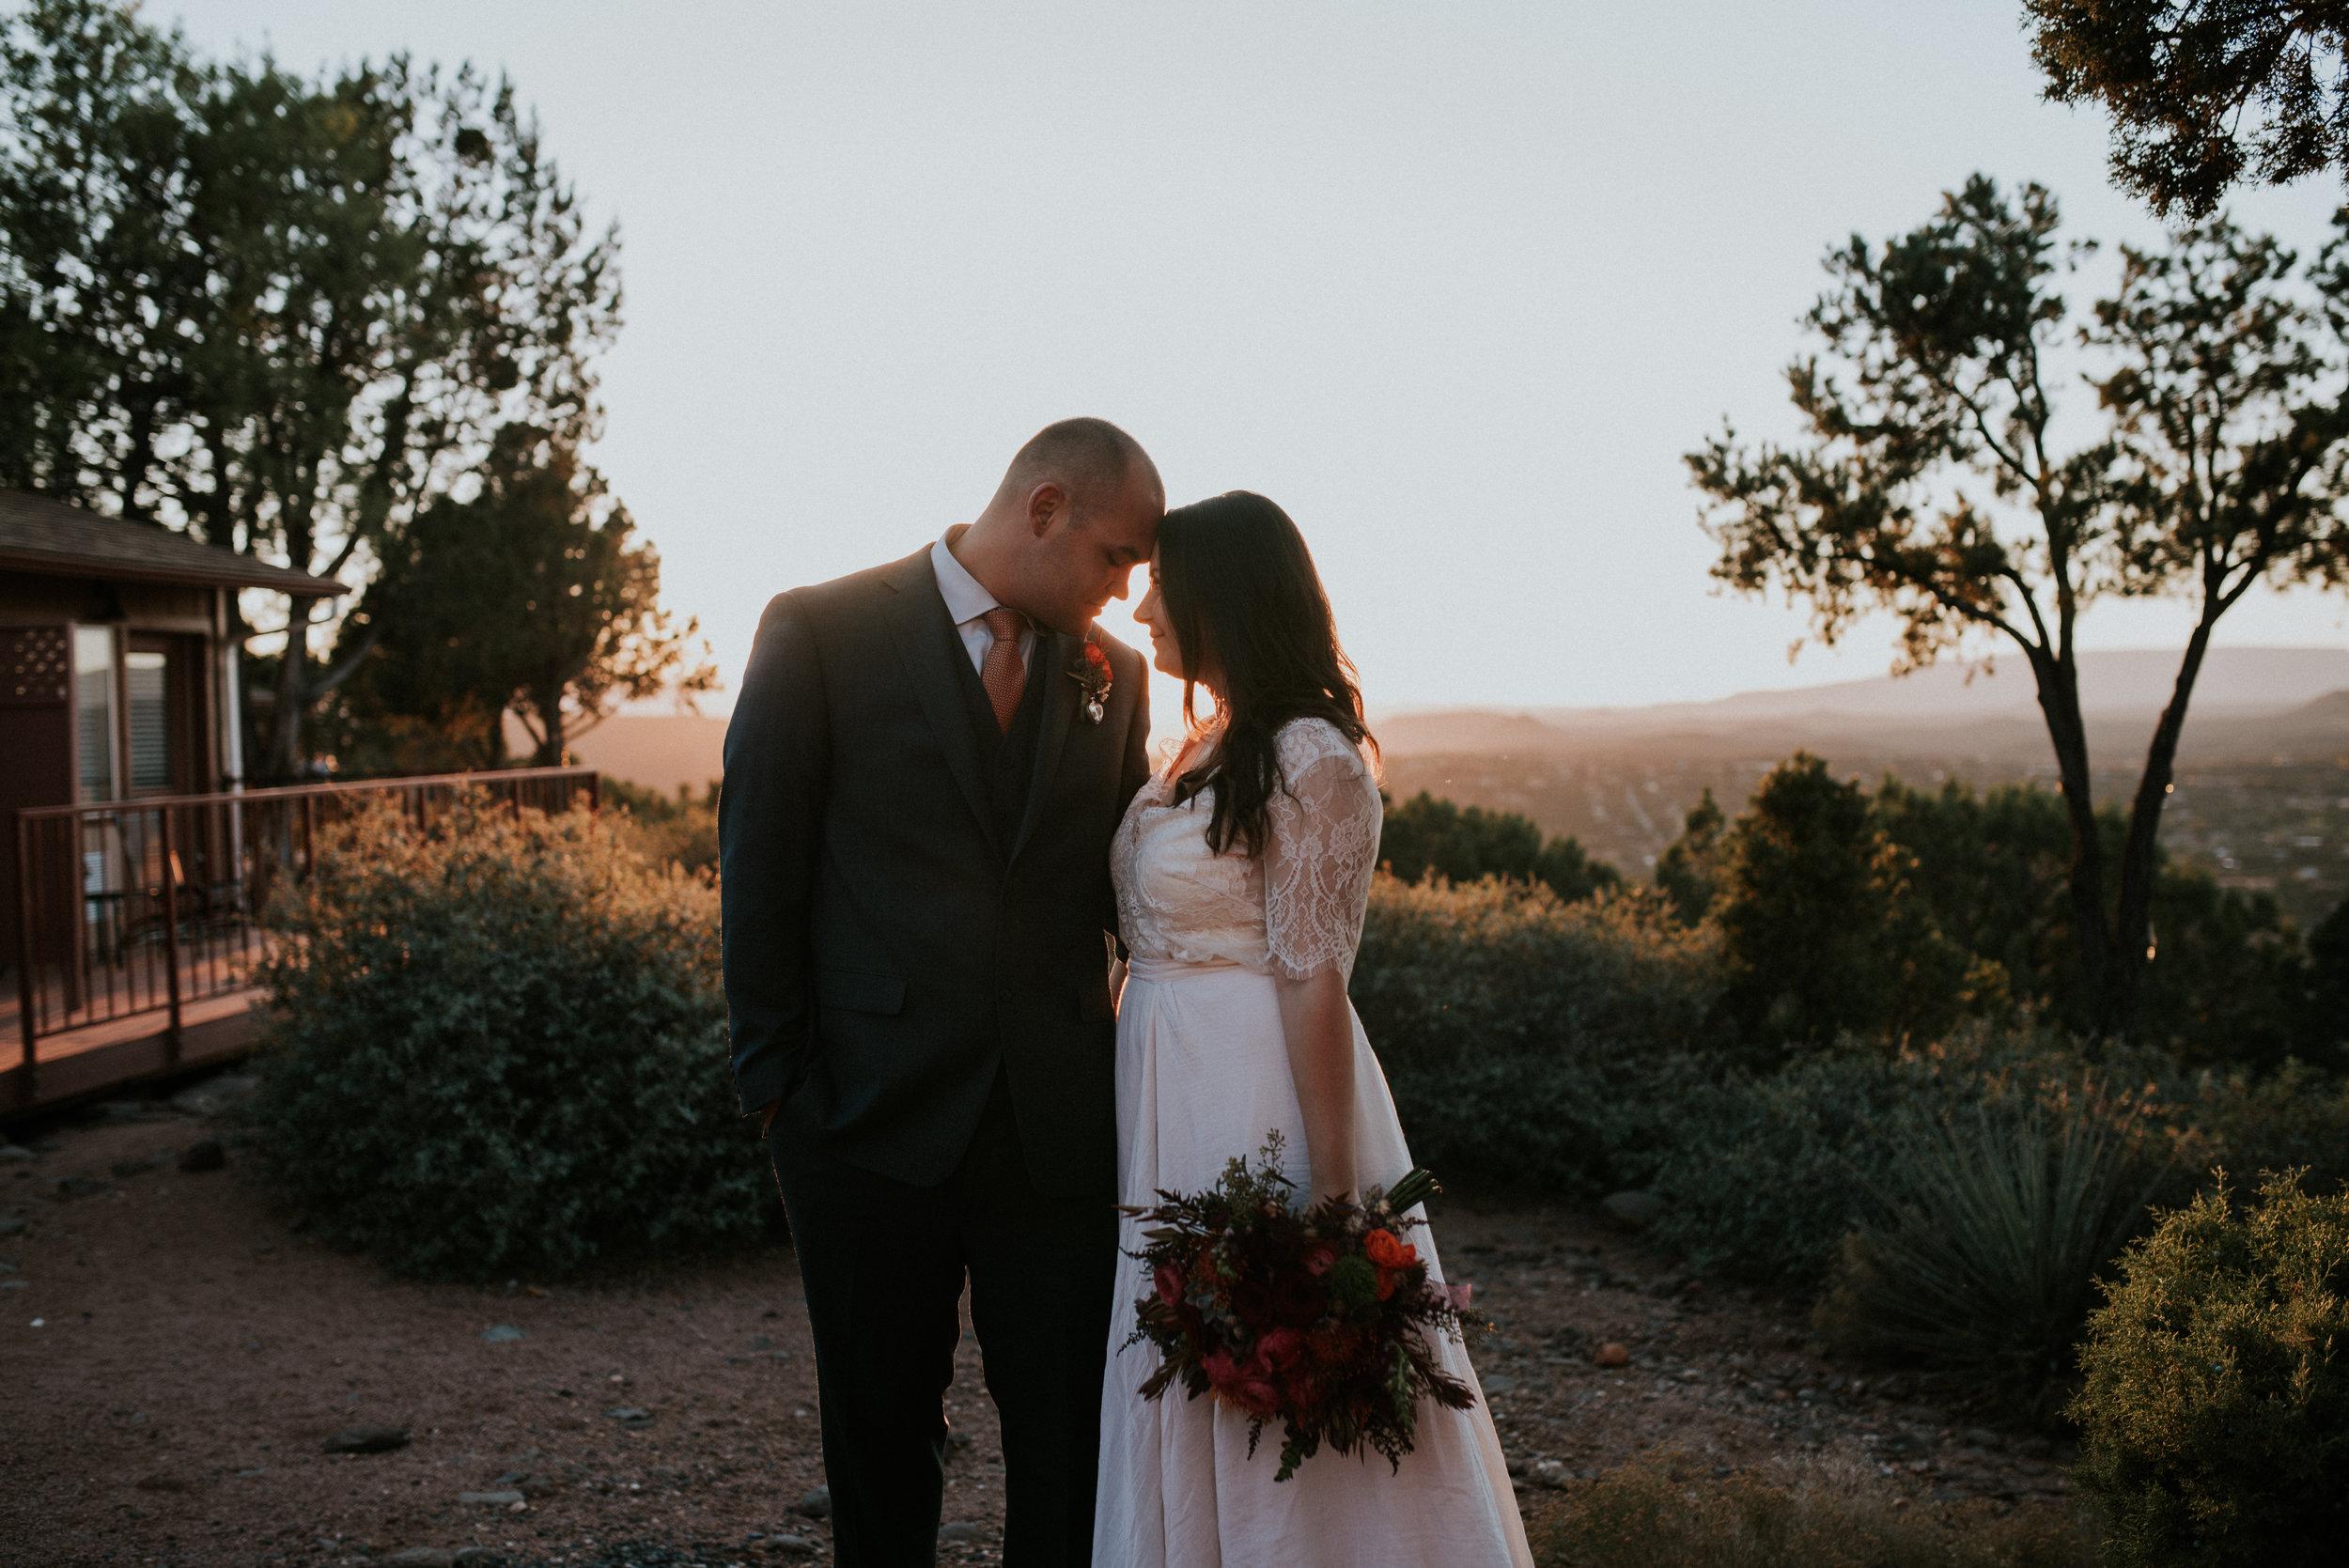 Intimate Adventure Fall Sedona Wedding-3.jpg